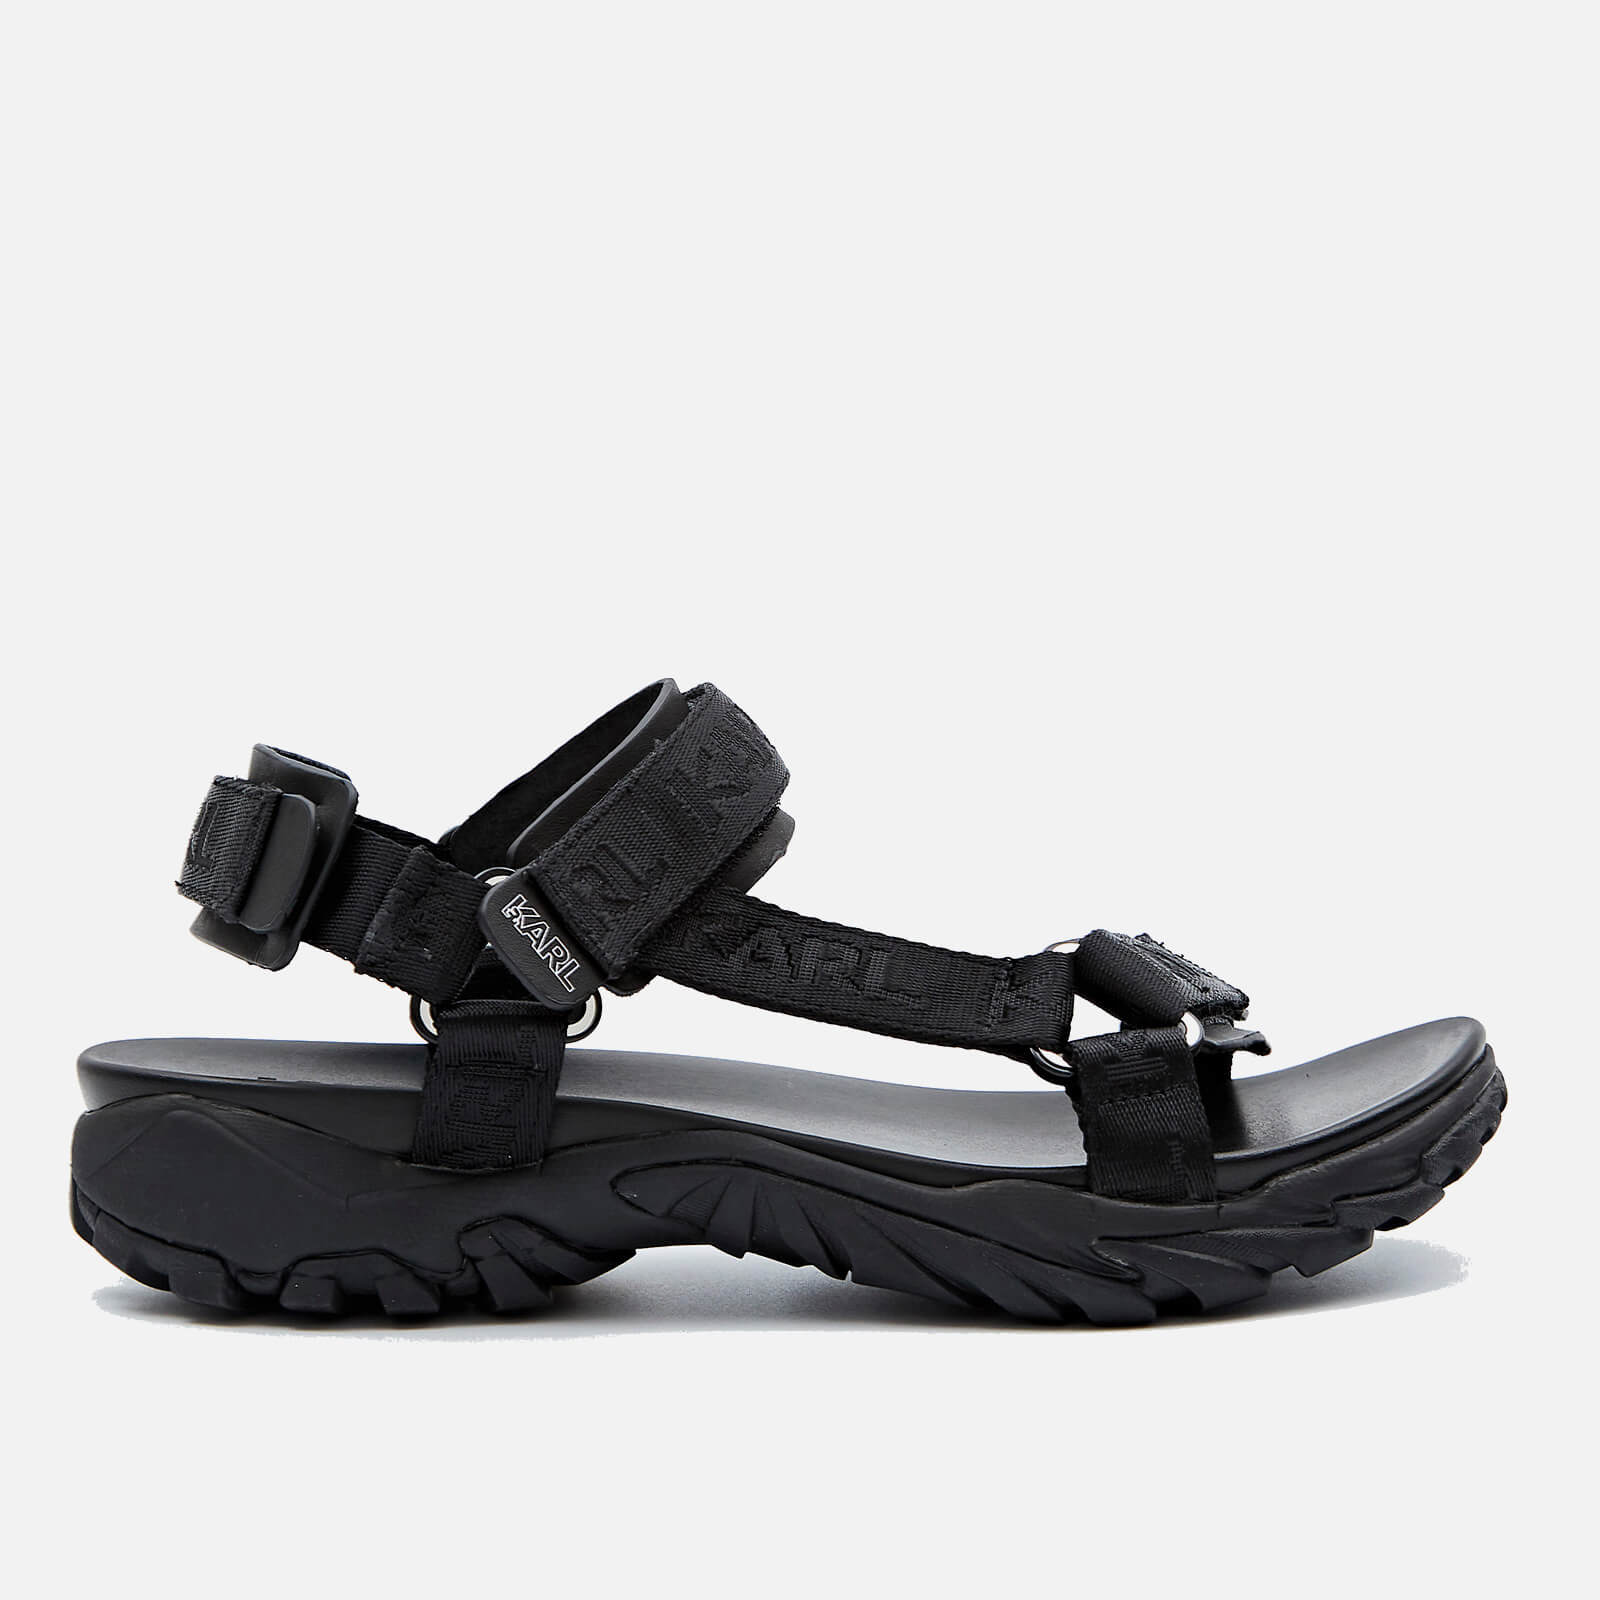 Karl Lagerfeld Mens Volt Aktiv Karl Strap Run Sandals Black Uk 10